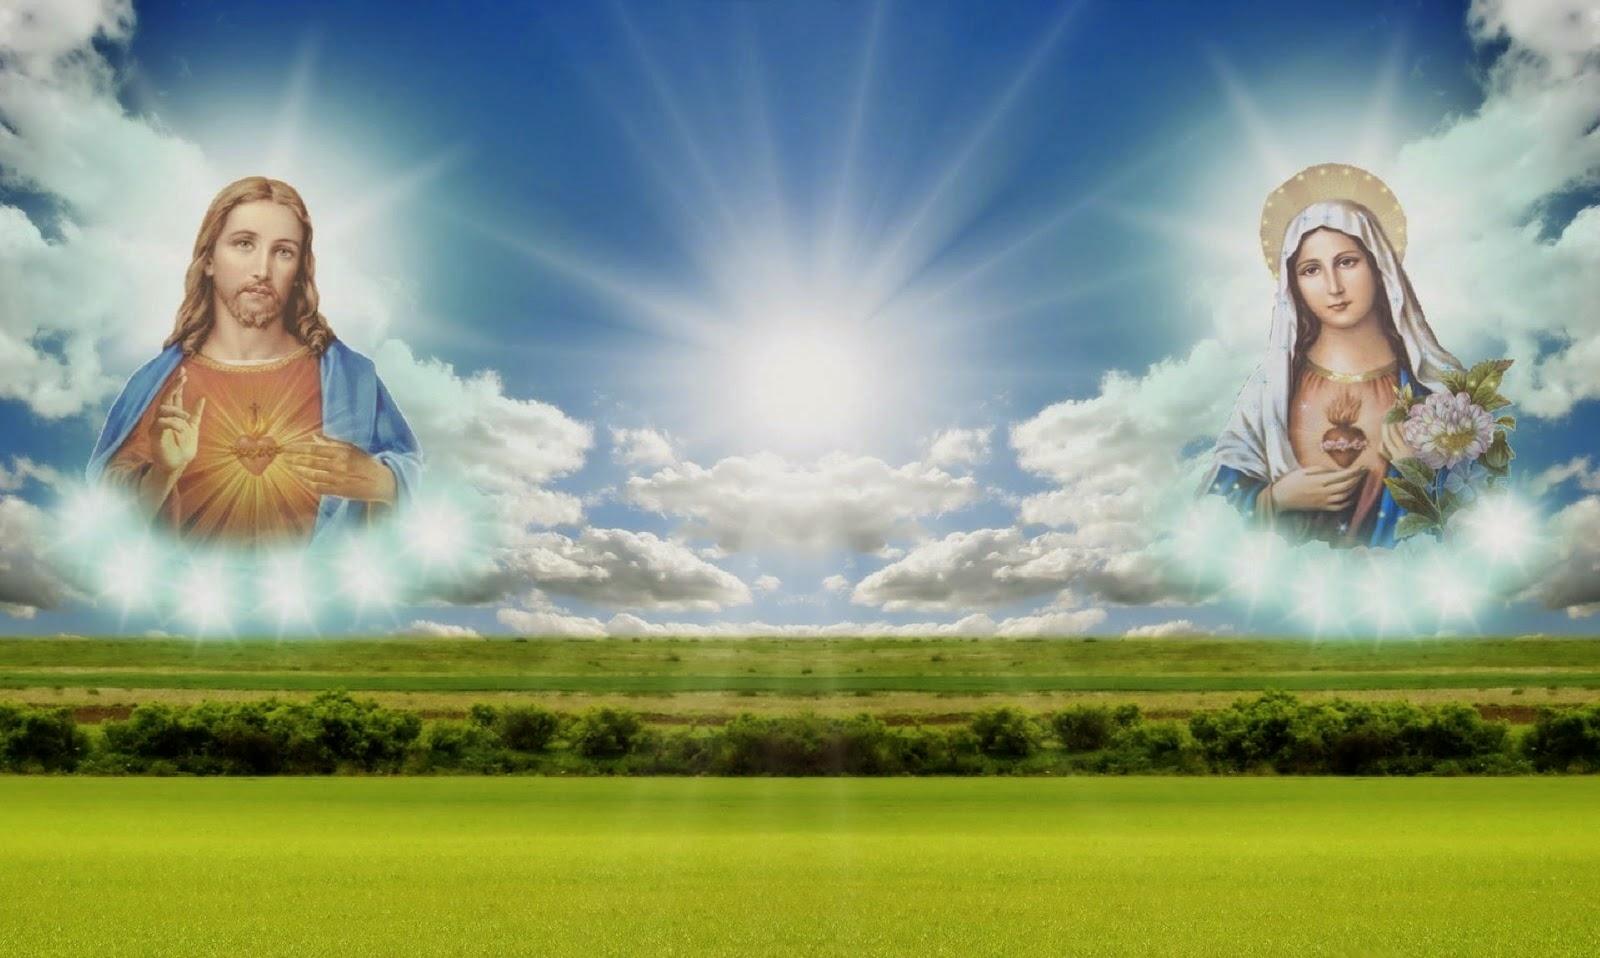 Fondo de pantalla religioso 3 fondos de escritorio gratis for Bajar fondos de pantalla religiosos gratis